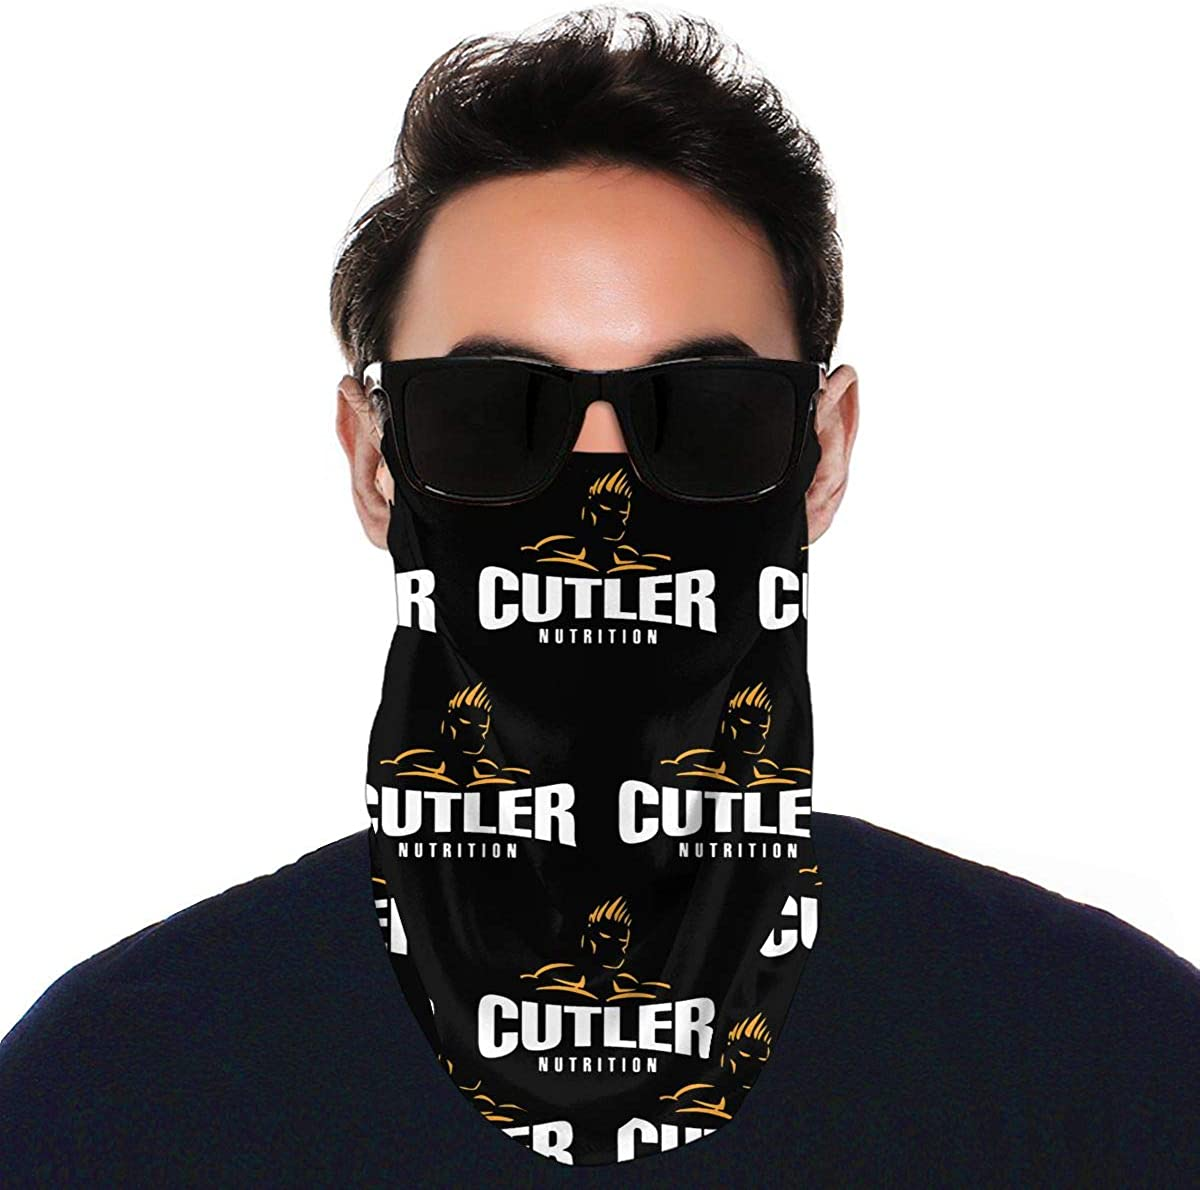 SIPONE Washable Men's & Women's Jay Cutler Reusable Multiuse Bandanas Neck Gaiter Print Mask